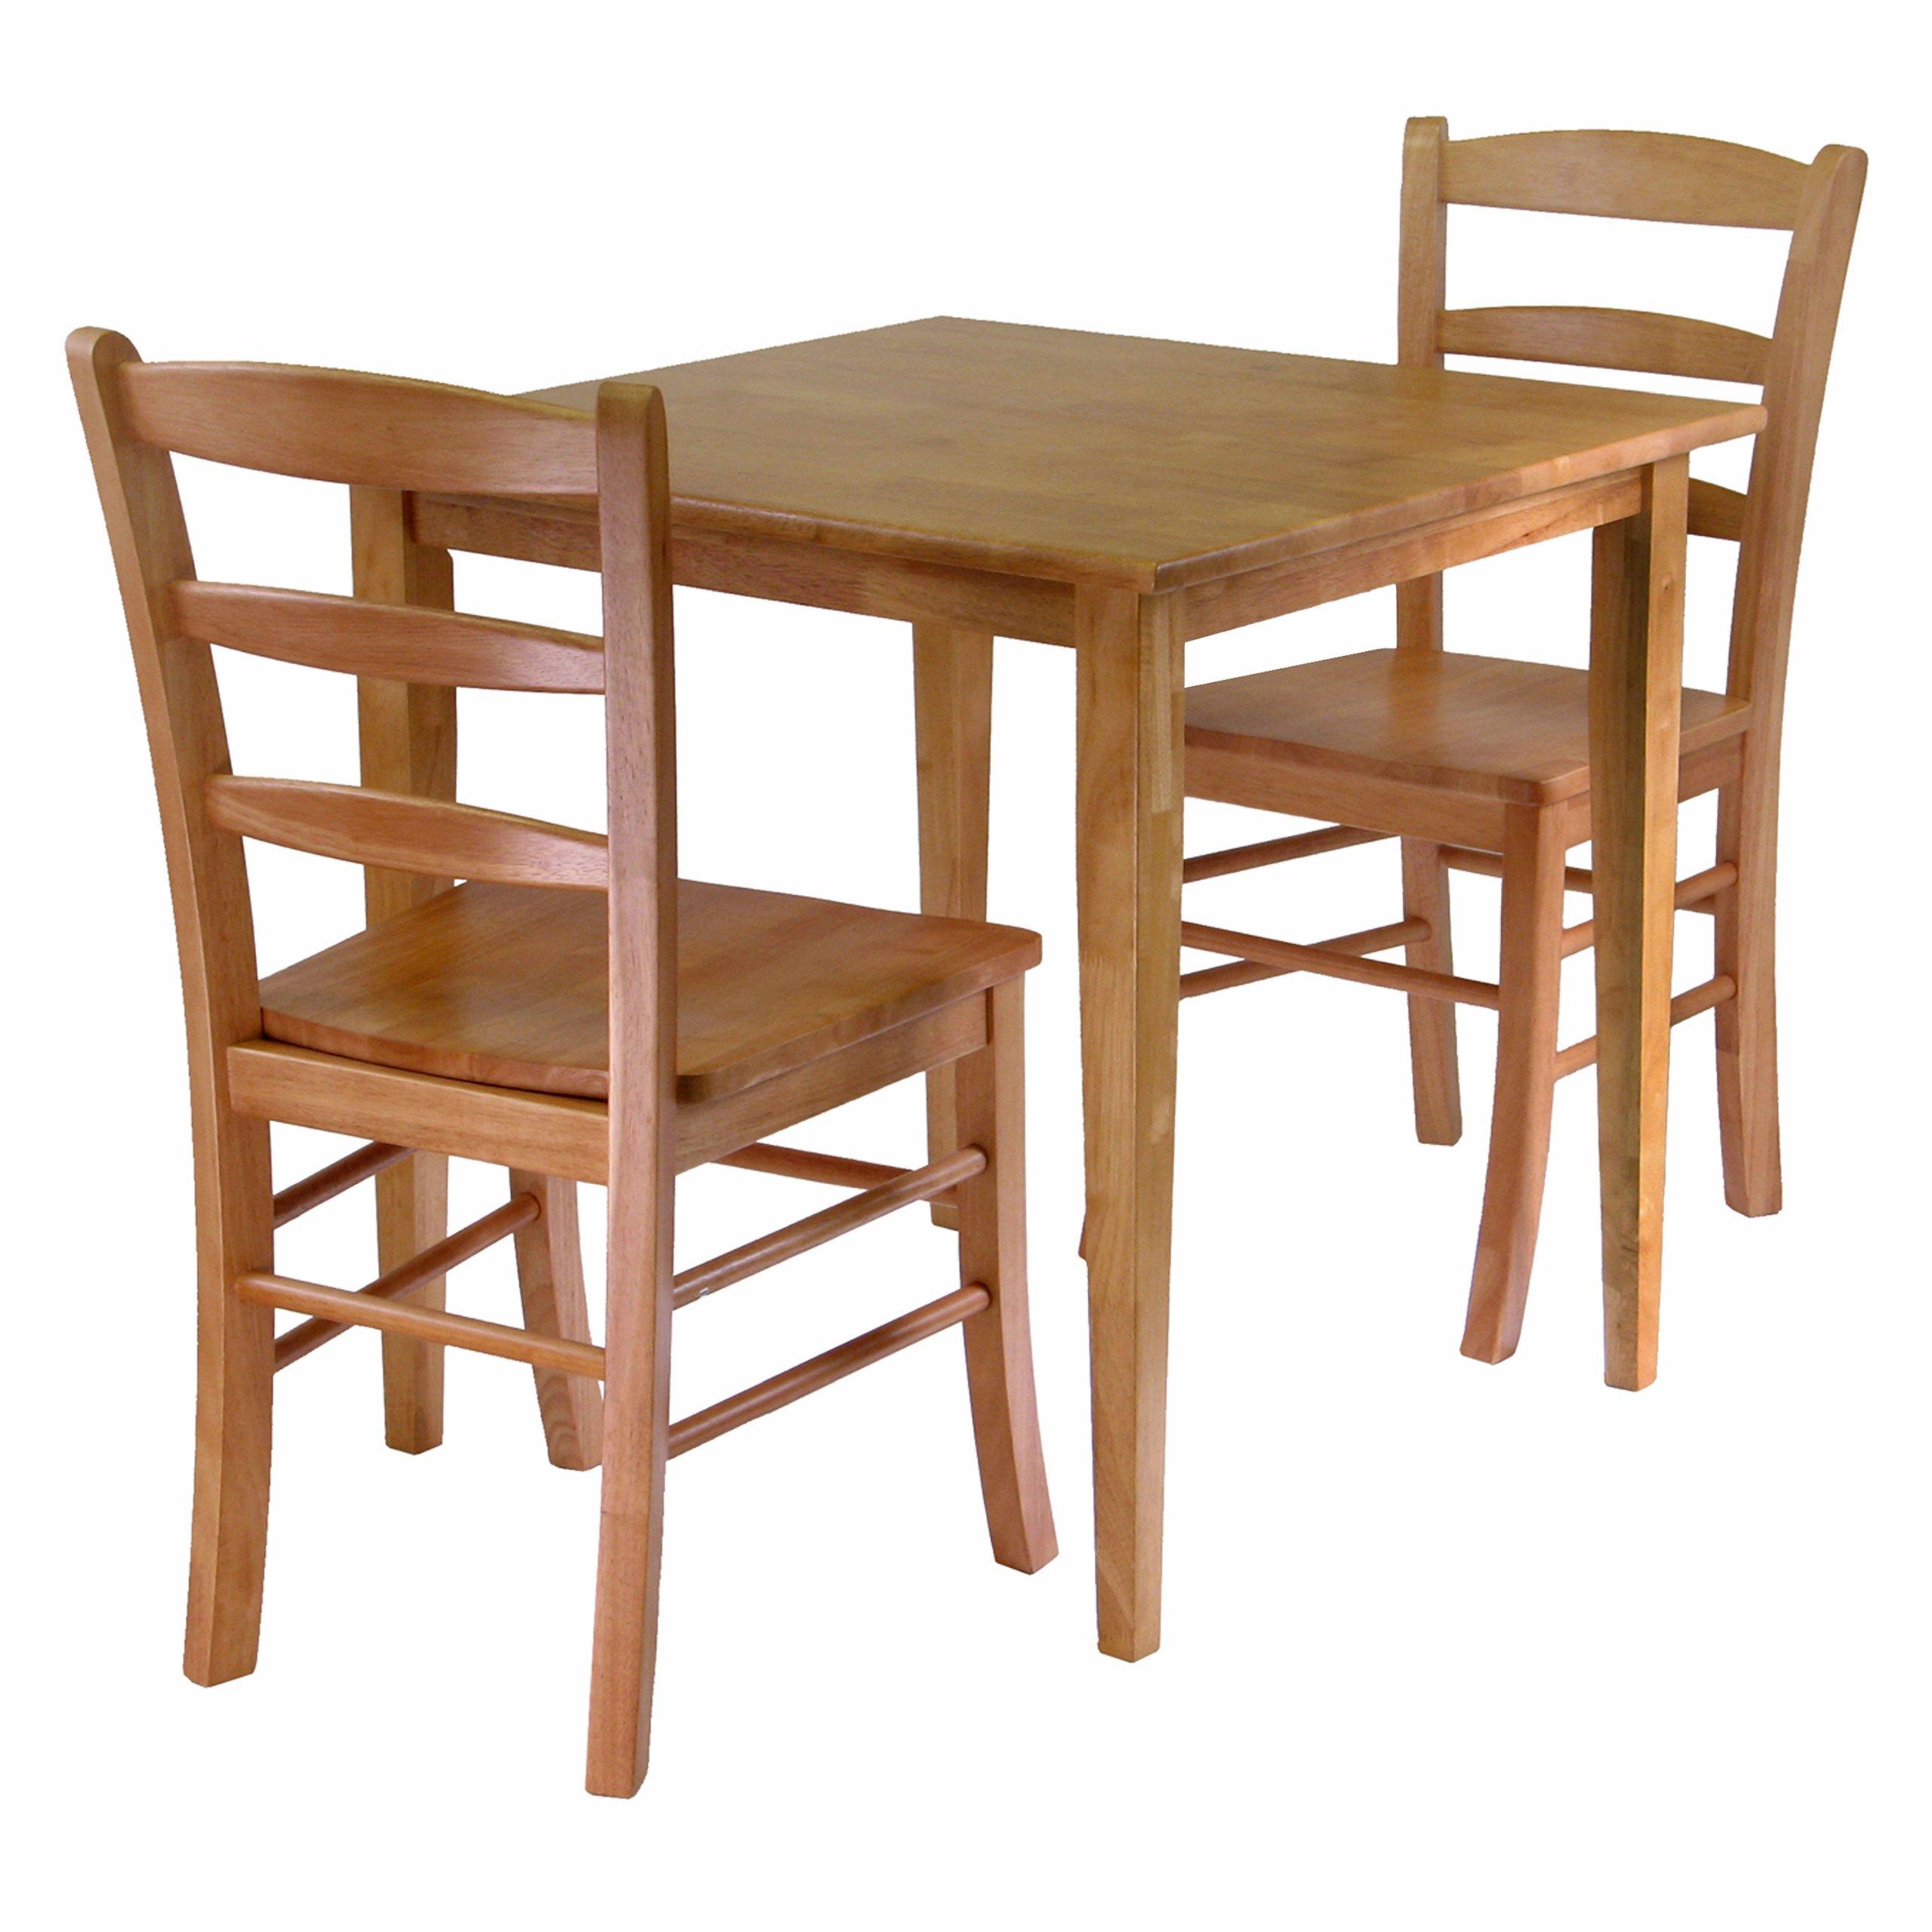 Winsome Groveland 3-Piece Wood Dining Set, Light Oak Finish by Winsome Wood